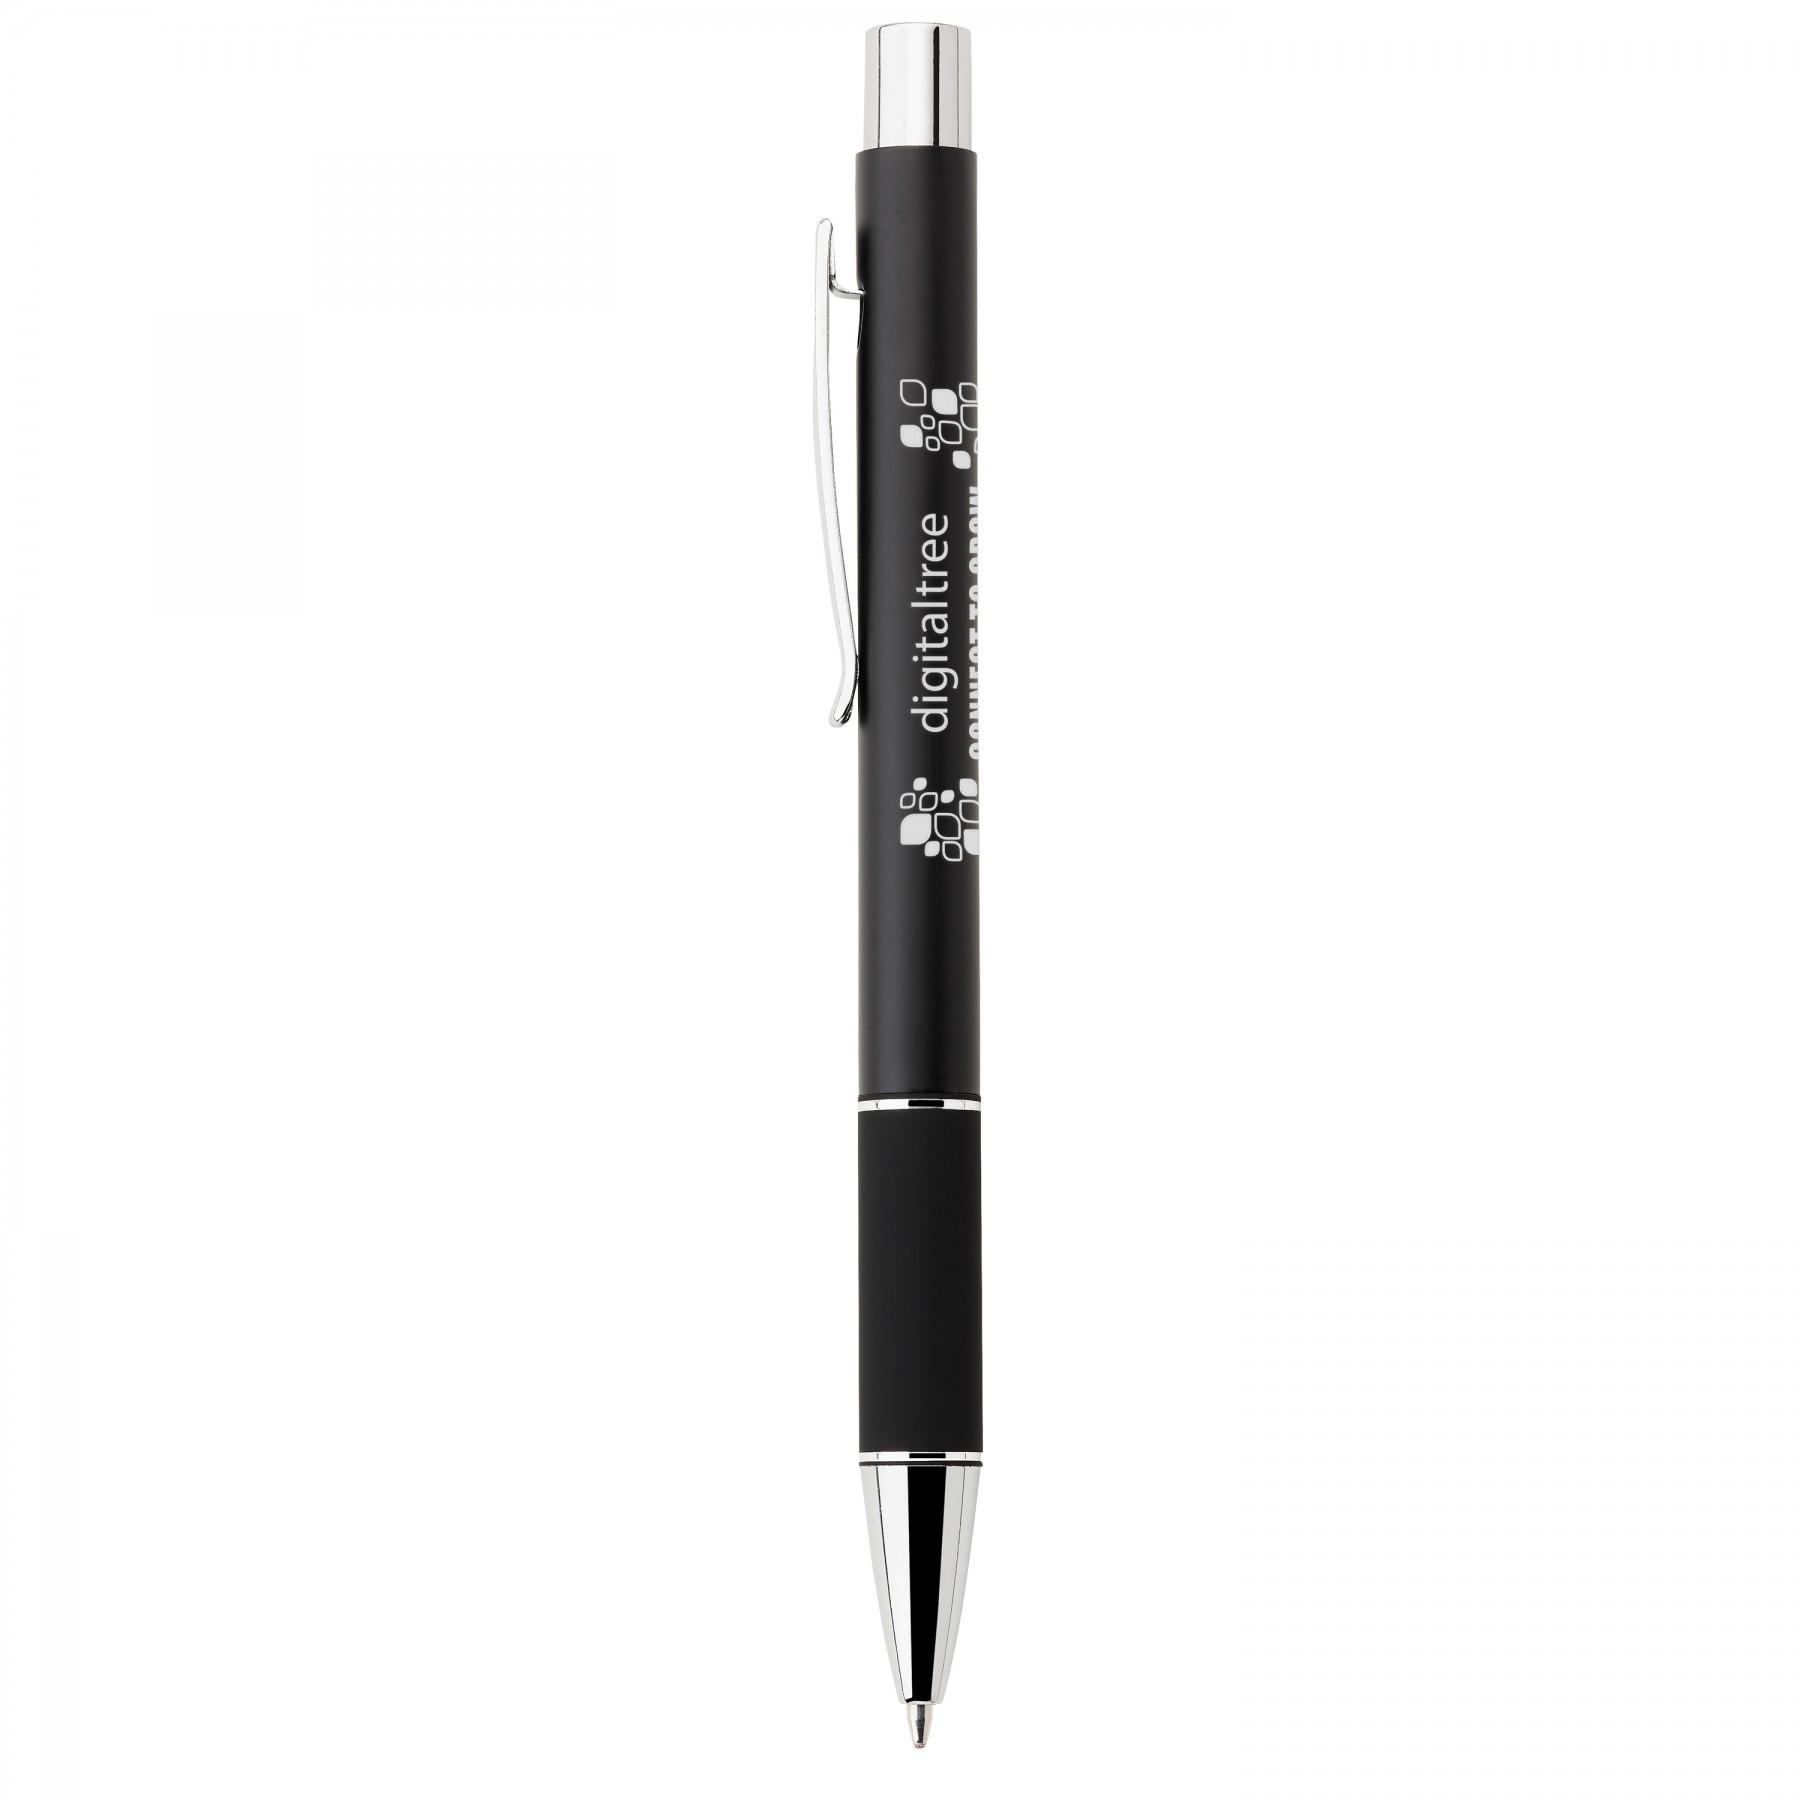 Petra Ballpoint Pen, G3157, Laser Engraved